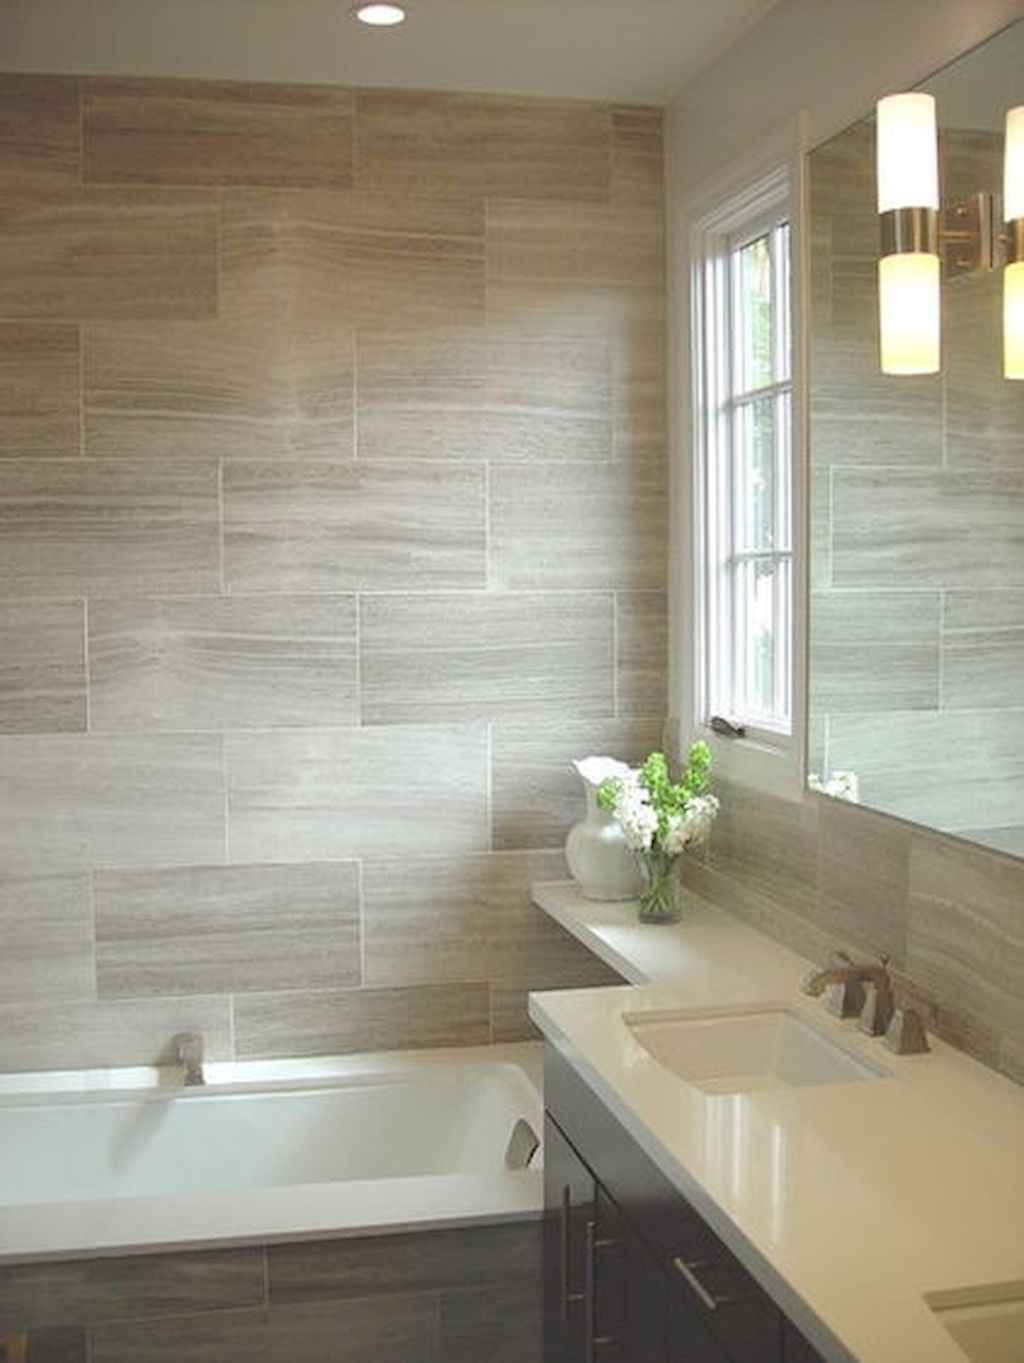 111 Brilliant Small Bathroom Remodel Ideas On A Budget (91)